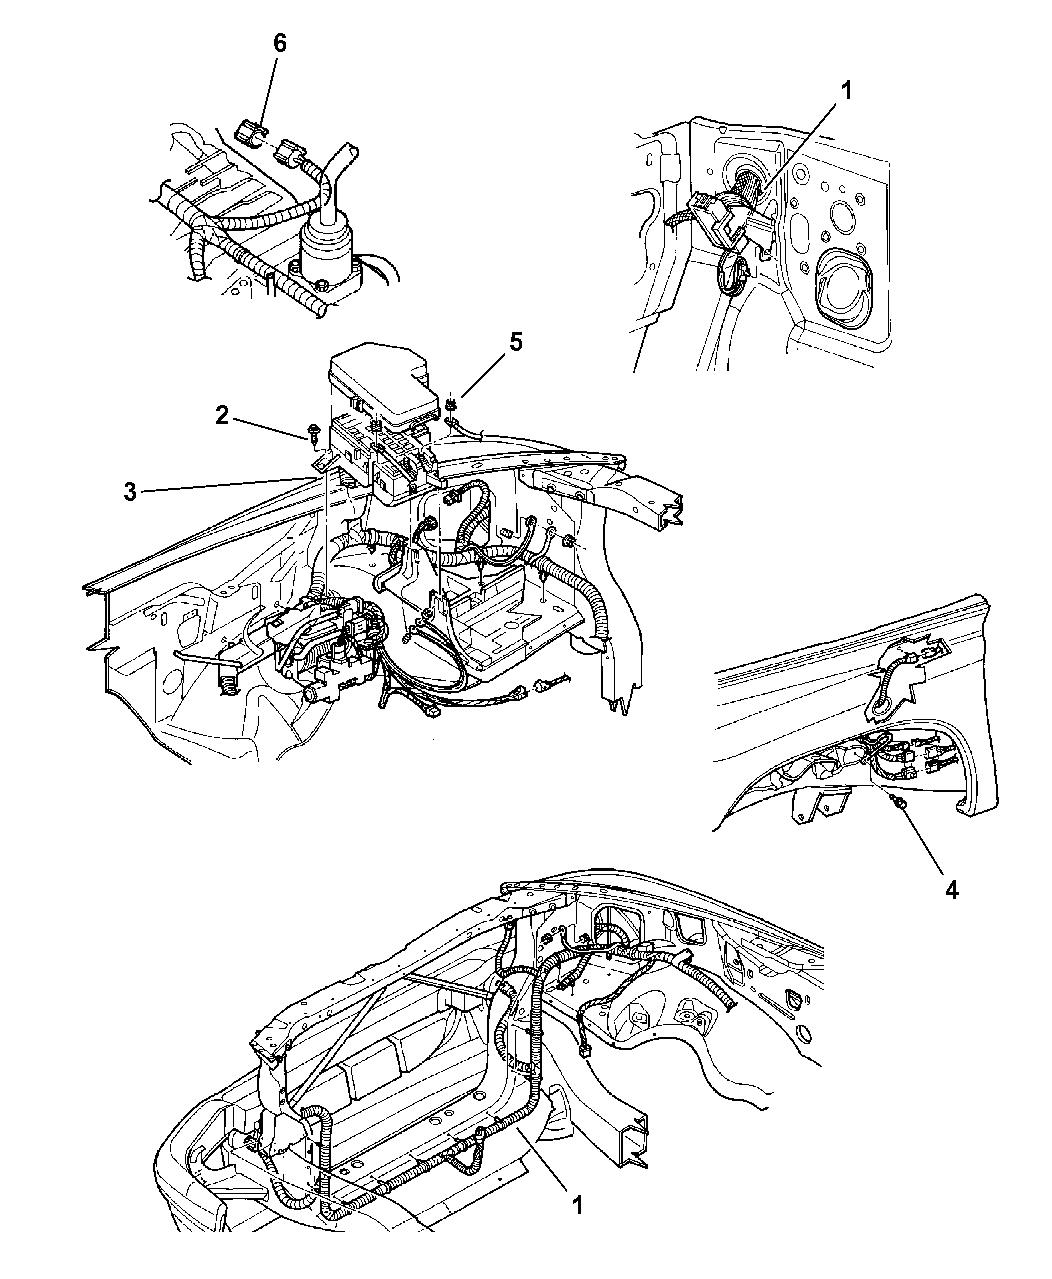 Wiring Diagram For 1998 Dodge Dakotum